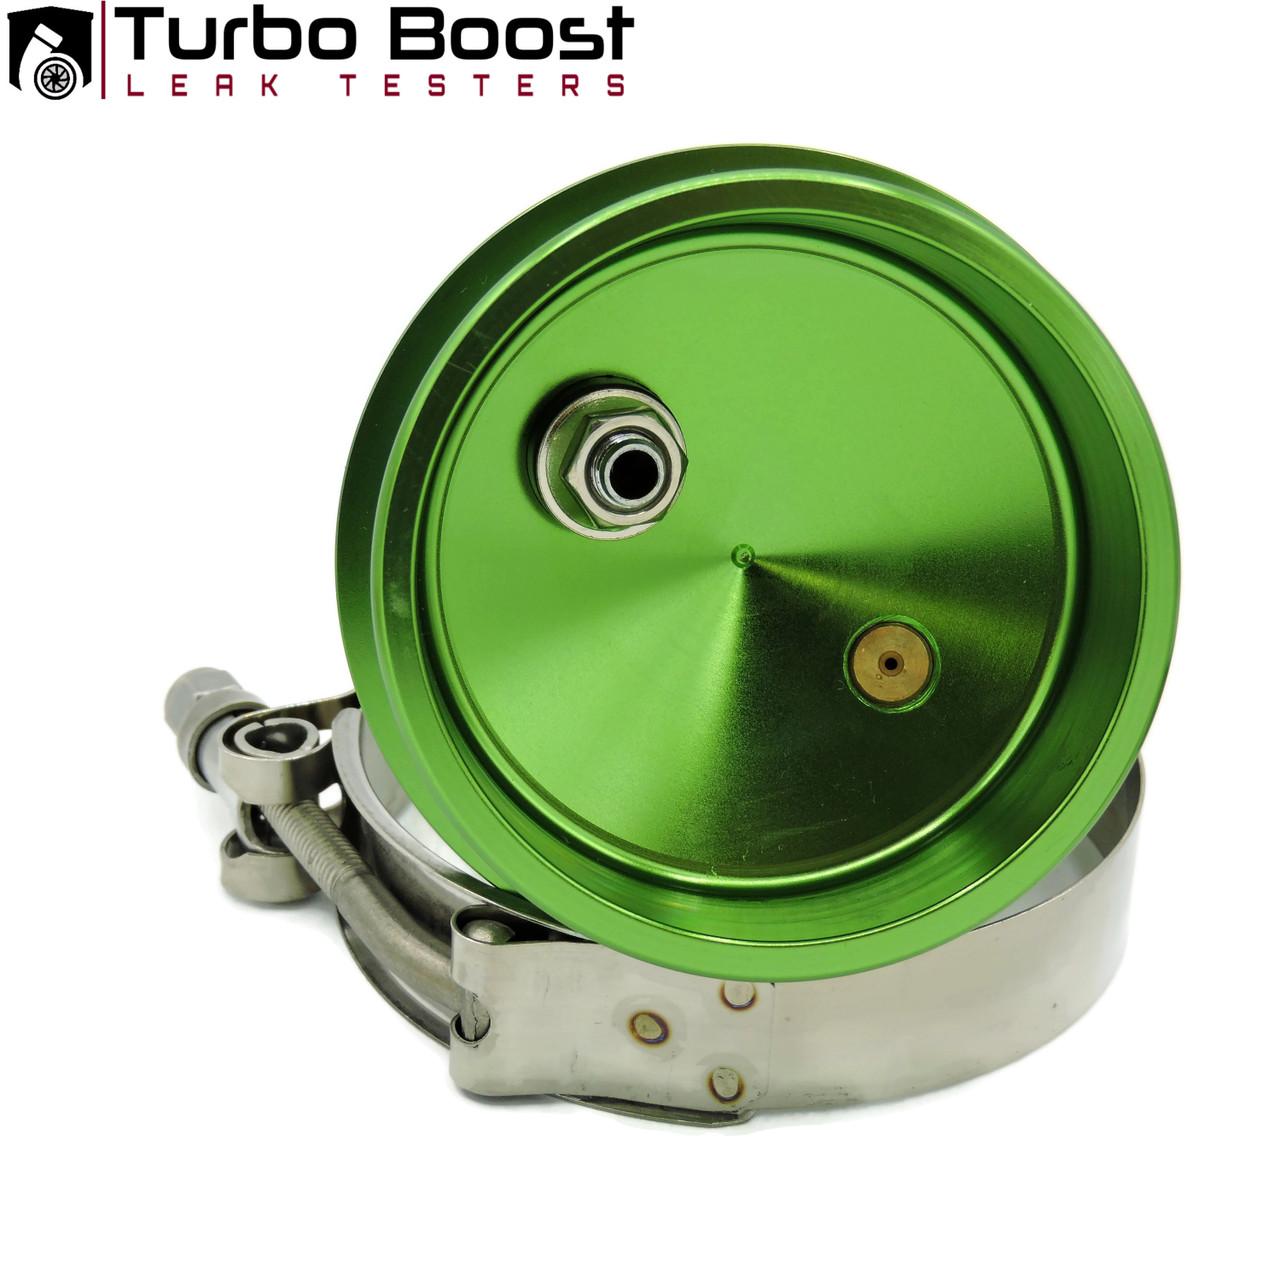 "GT-R R35 Twin Turbo '09-'18 - Billet Aluminum Boost Leak Tester -  3"" Intakes"